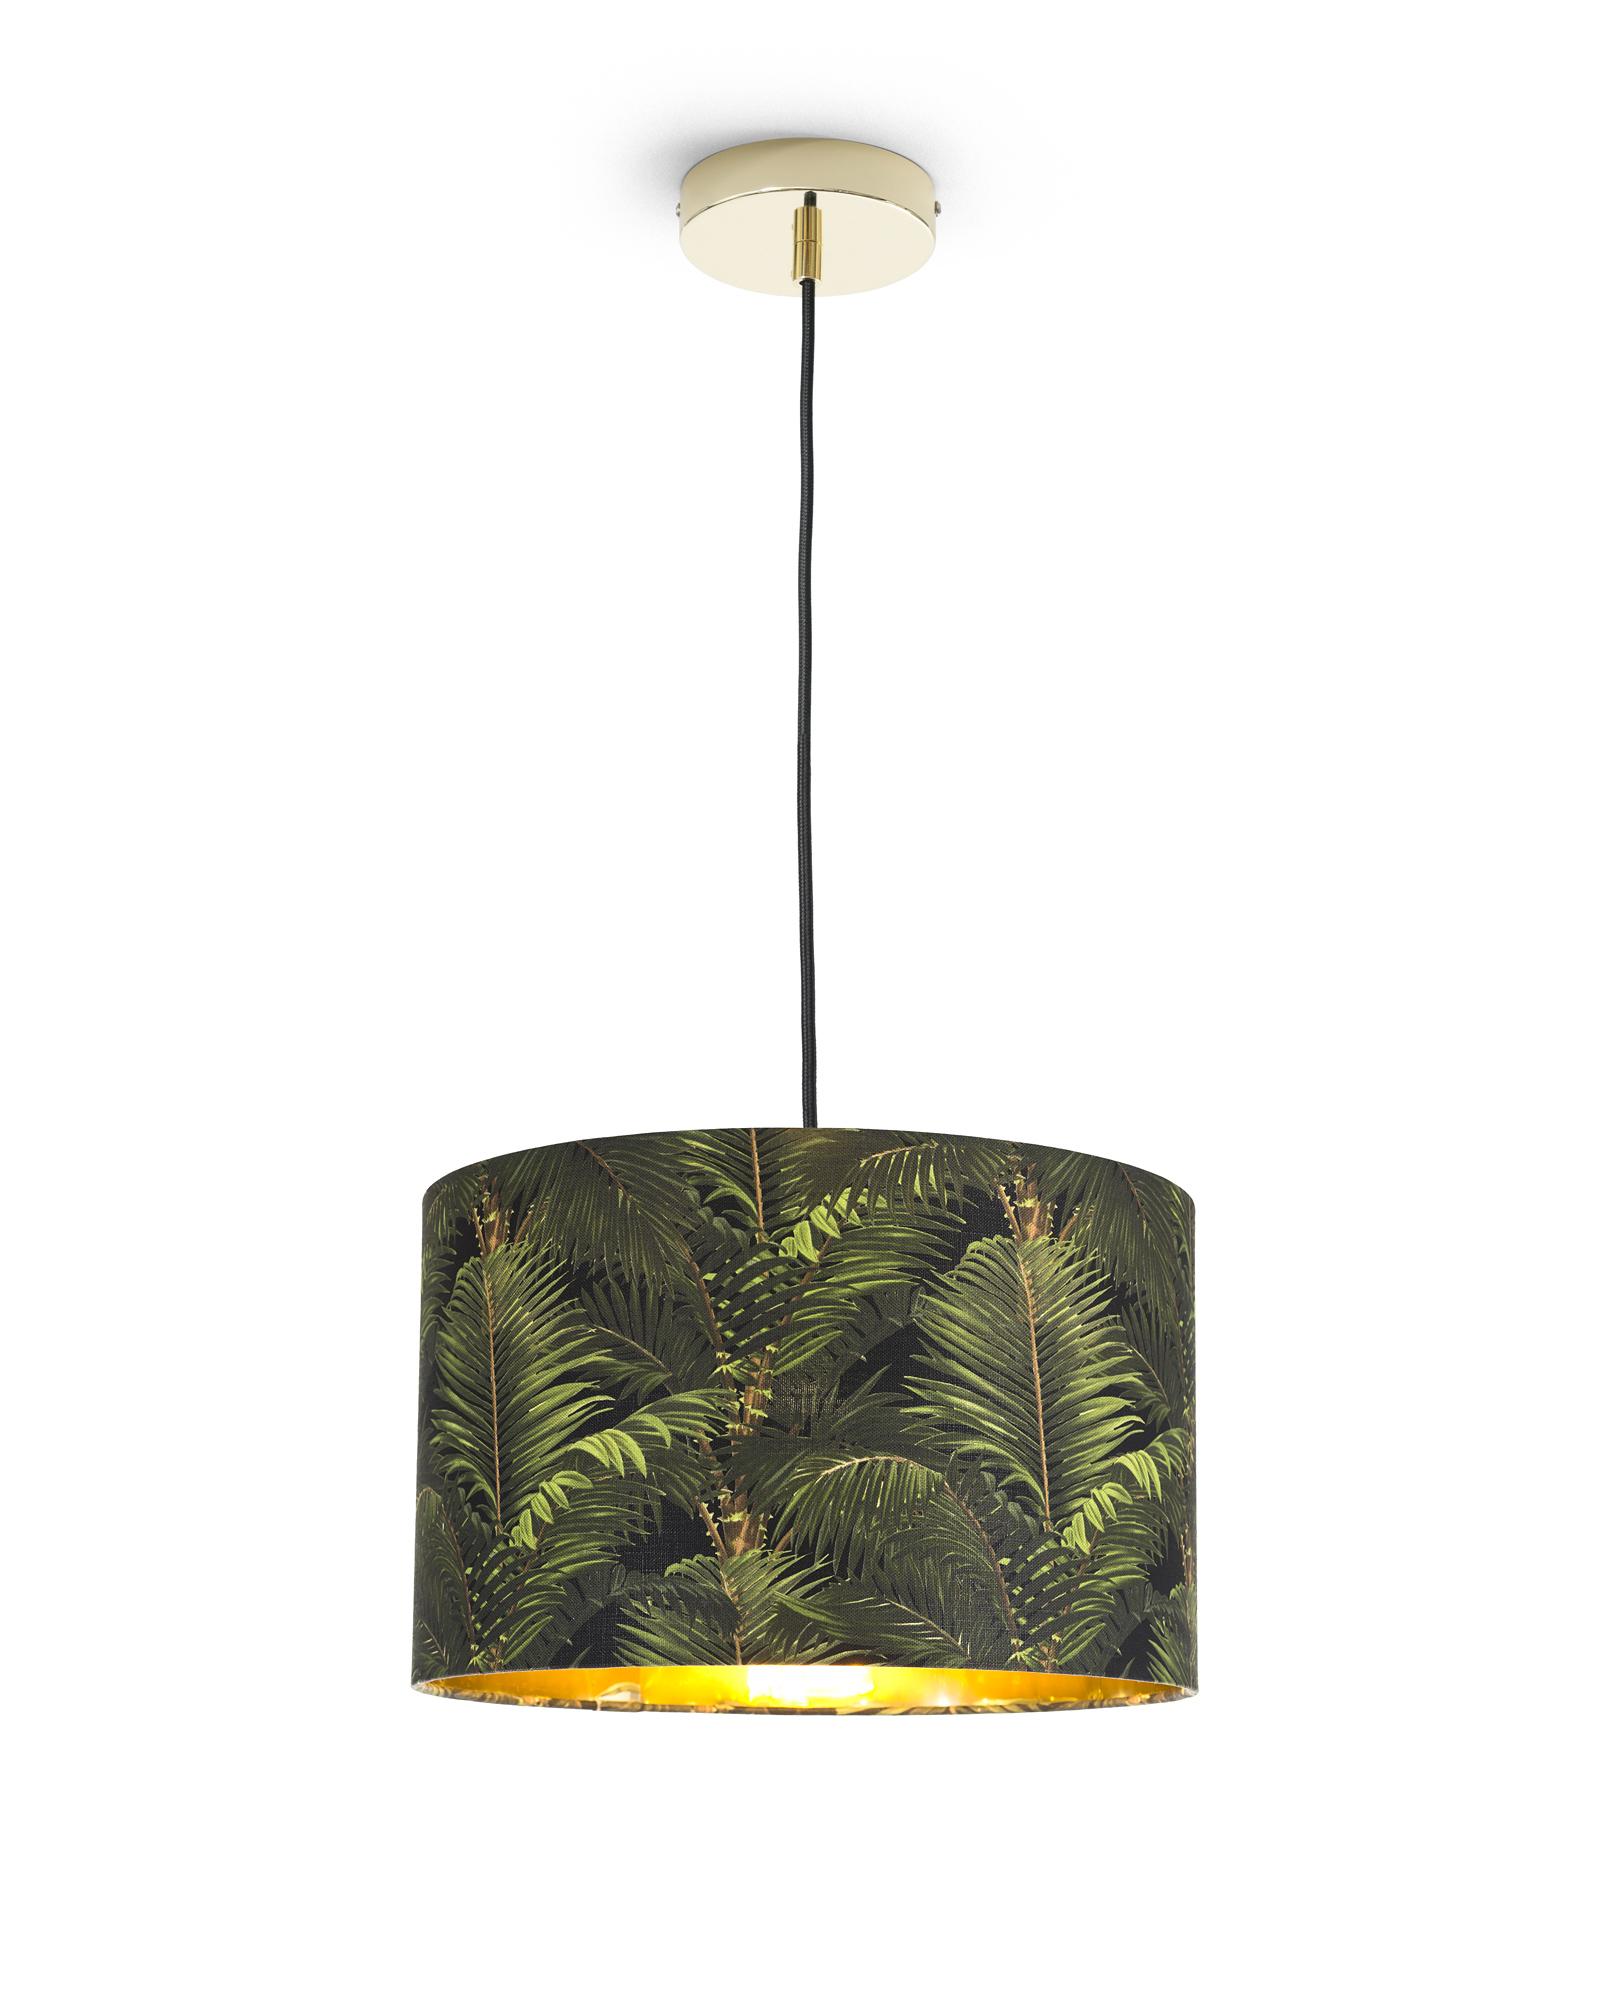 JARDIN TROPICAL Pendant Light 45cm x 28cm